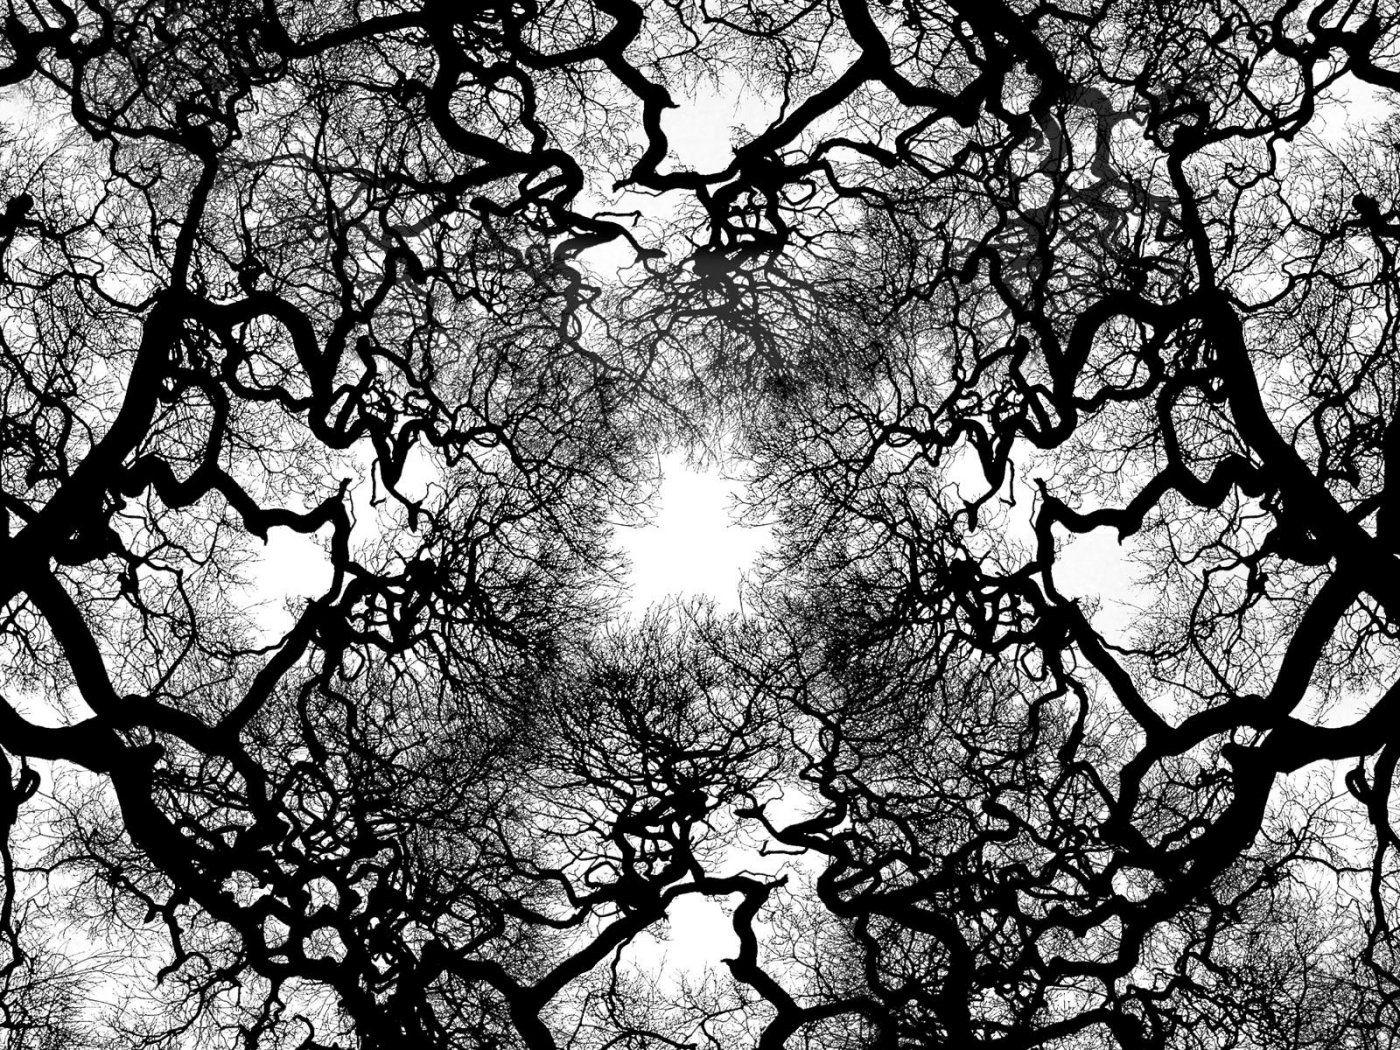 wallpaper trees, nature, upward view, black and white